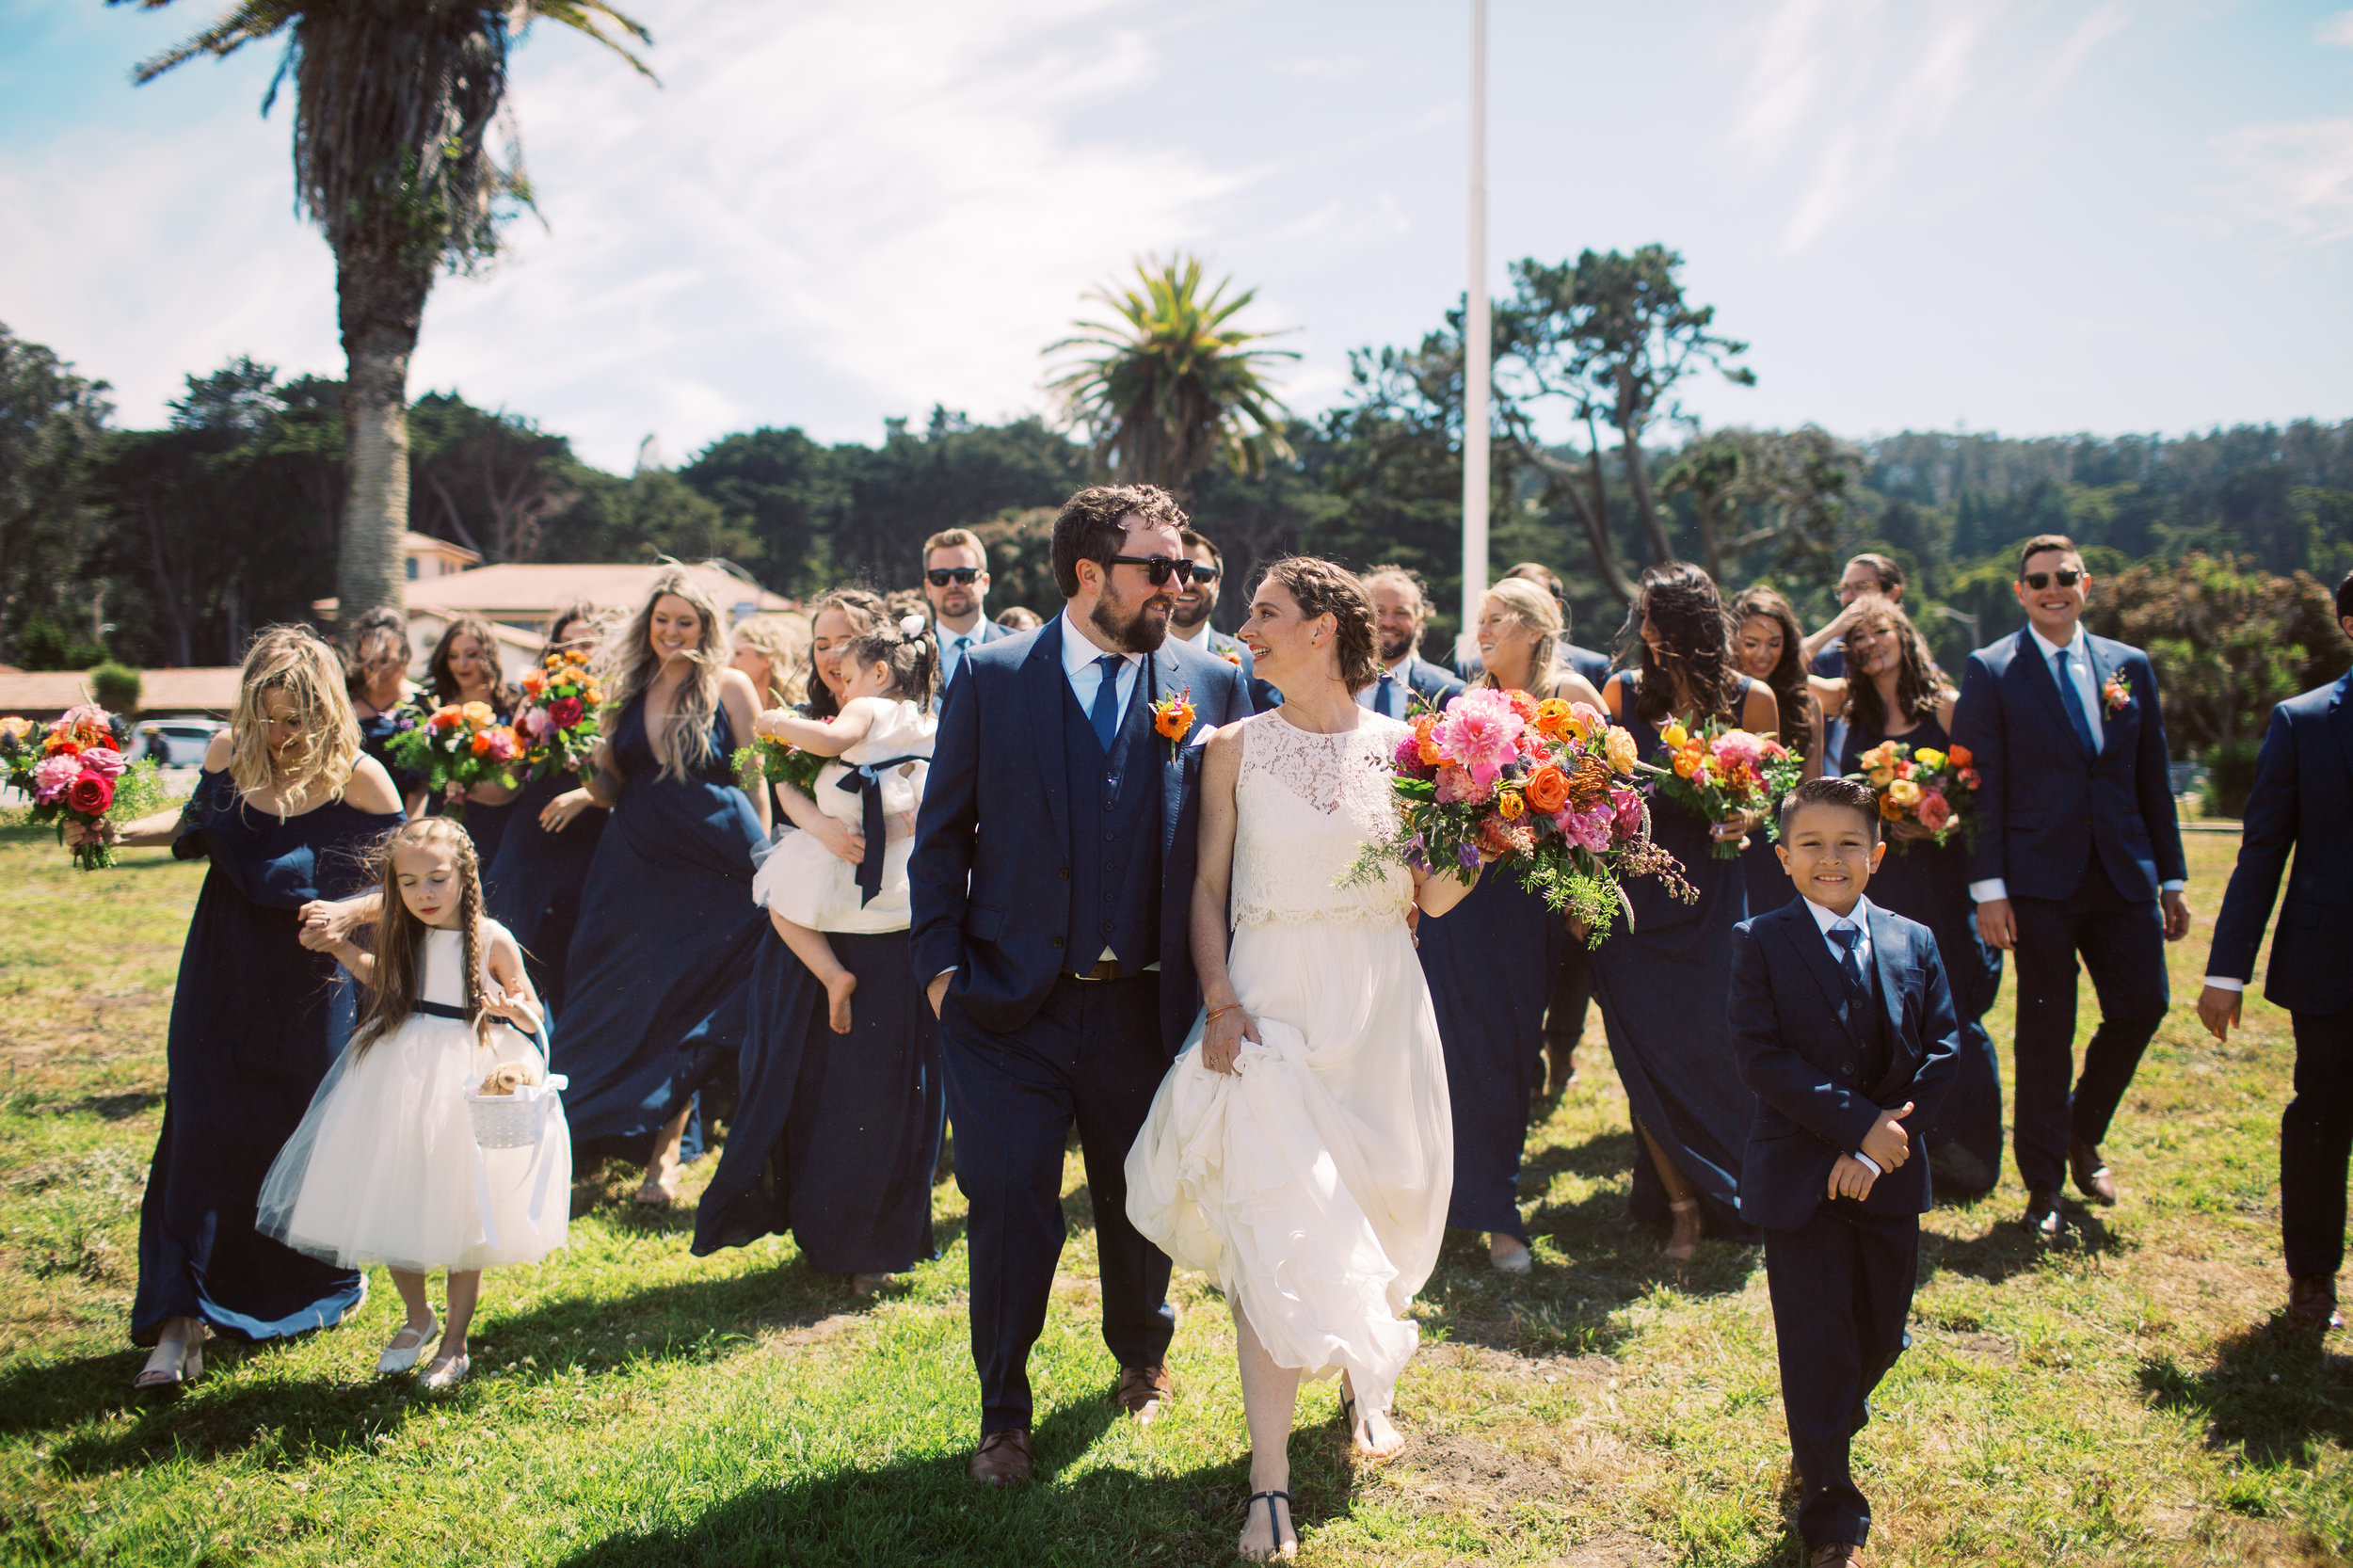 Tucker_Kristina_Wedding_Presidio_San_Francisco_Abigail_Malone_Photography-572.jpg